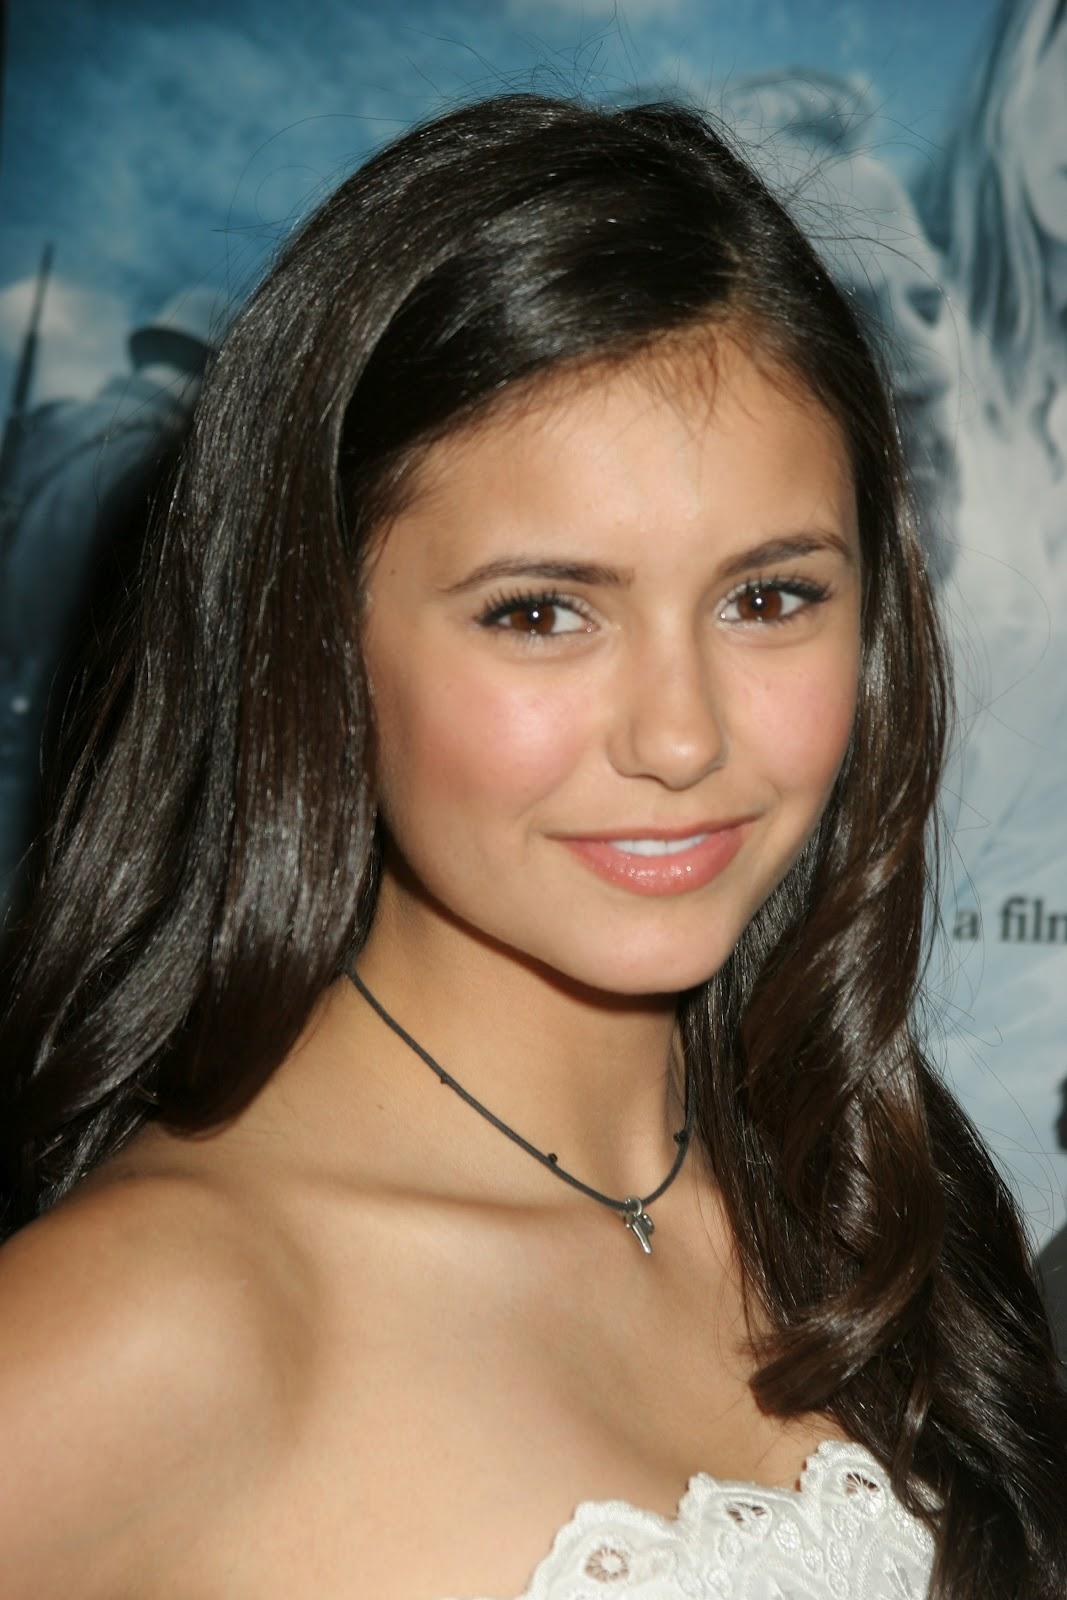 Ashley cole dating 2012 7